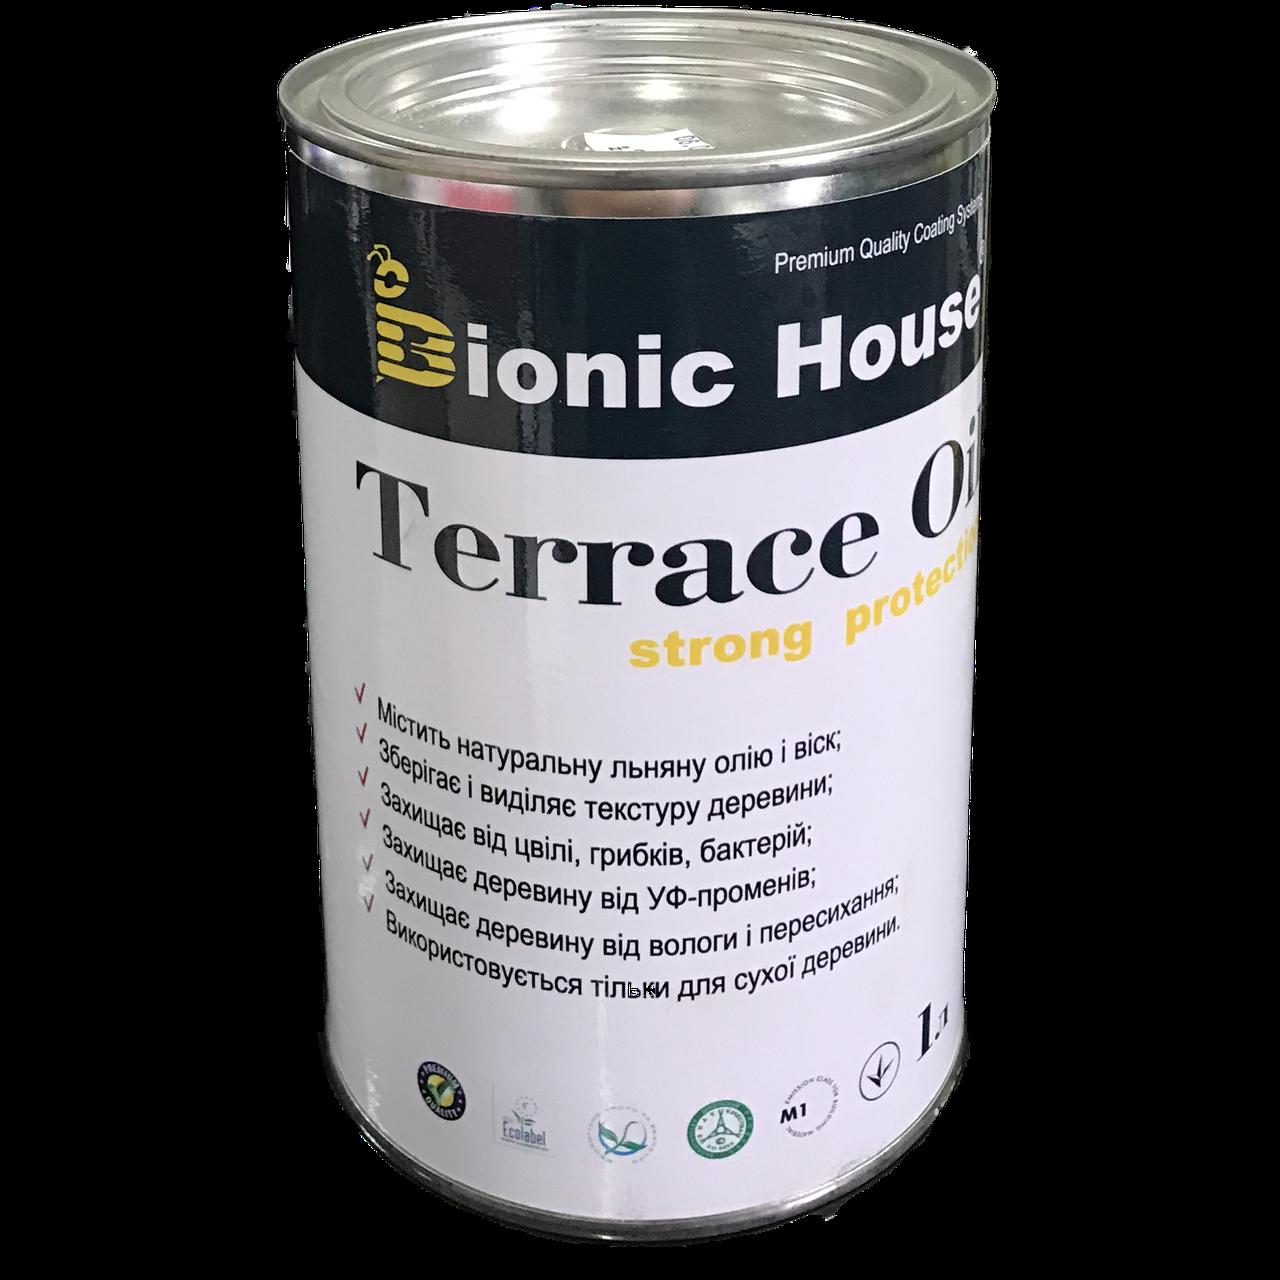 Олія для терас strong protection Bionic House 1л